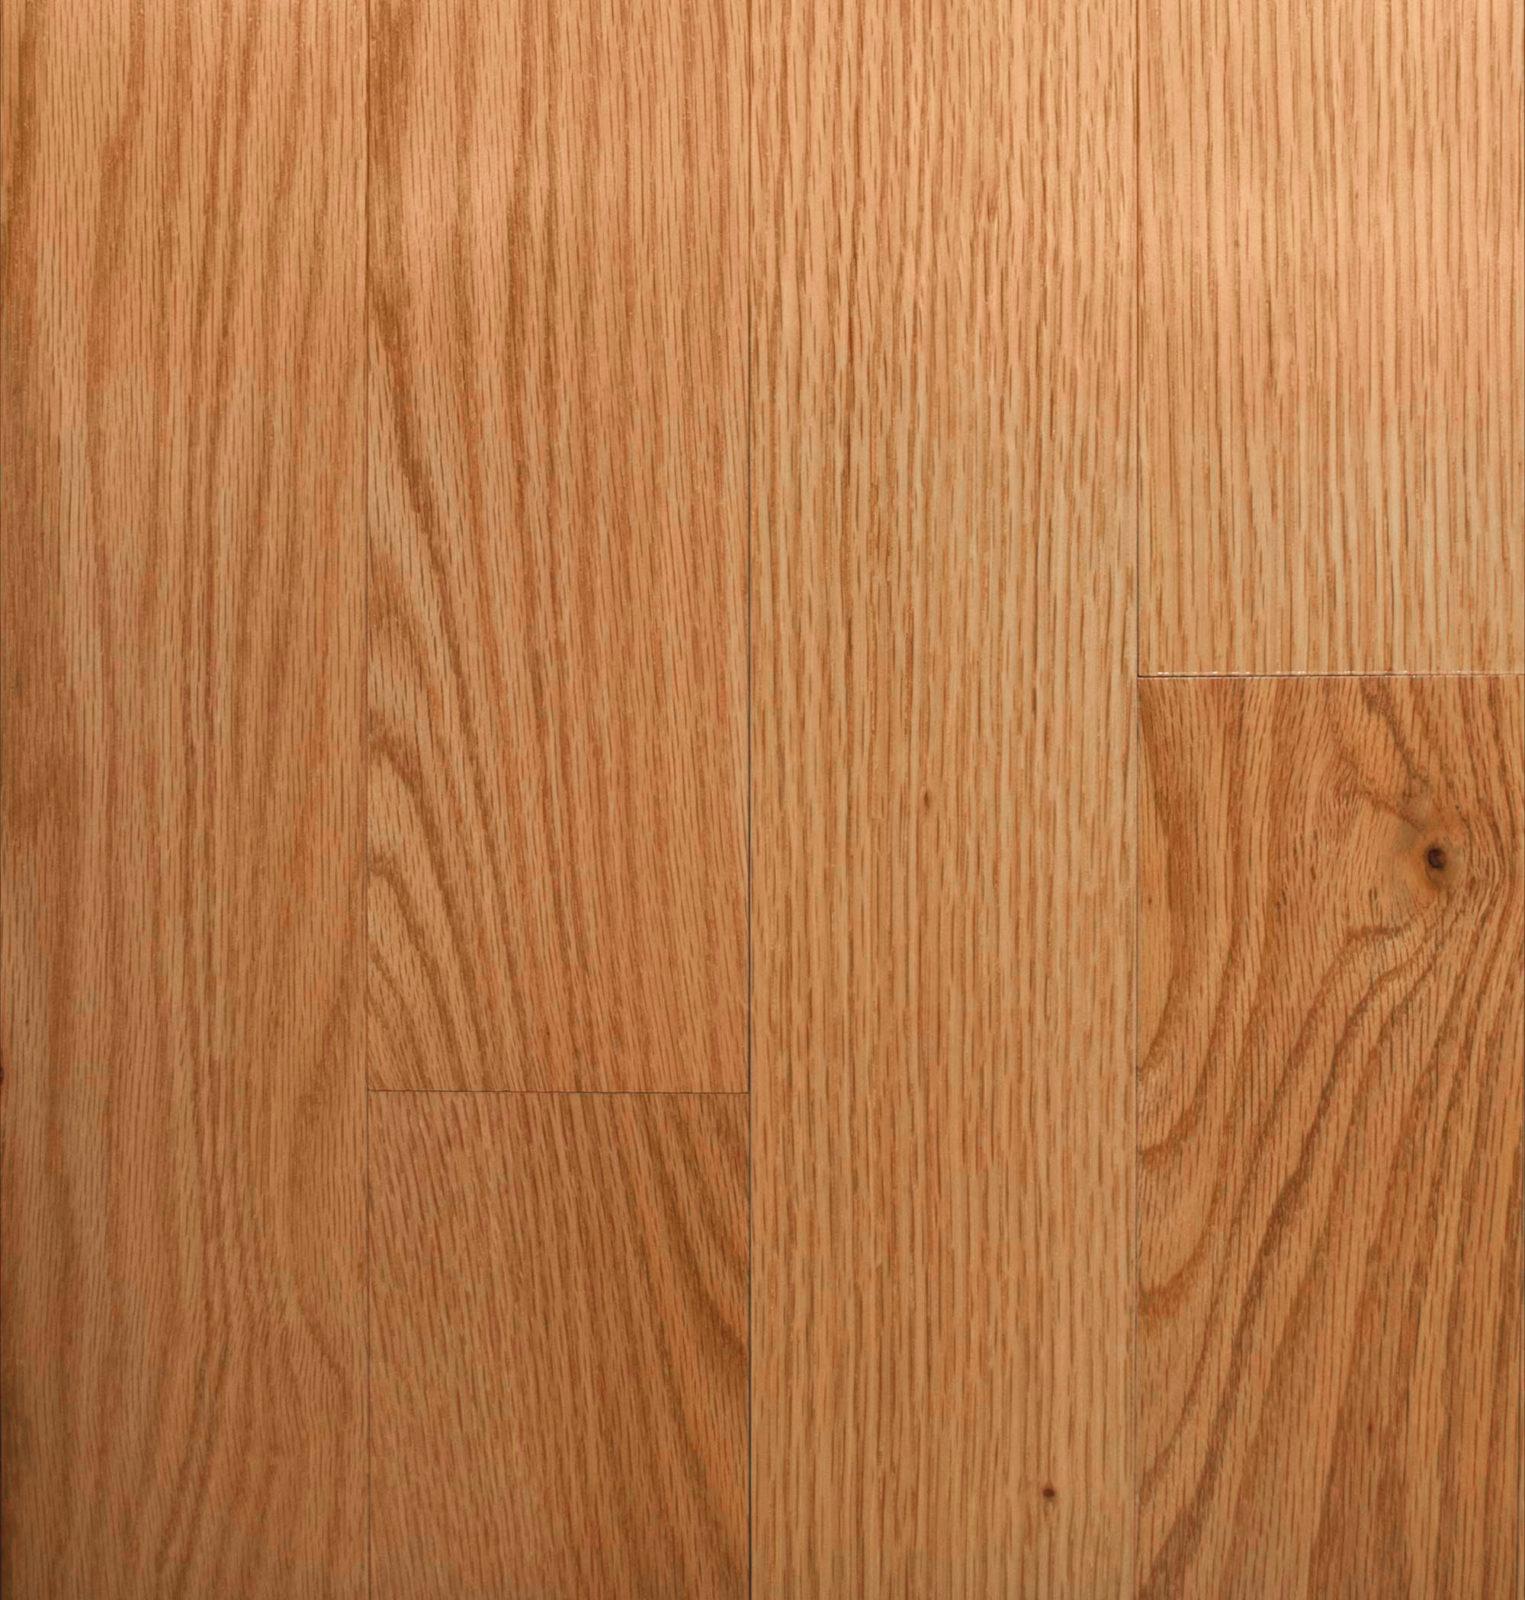 mohawk hardwood flooring mohawk natural oak hardwood flooring UXKPBFA